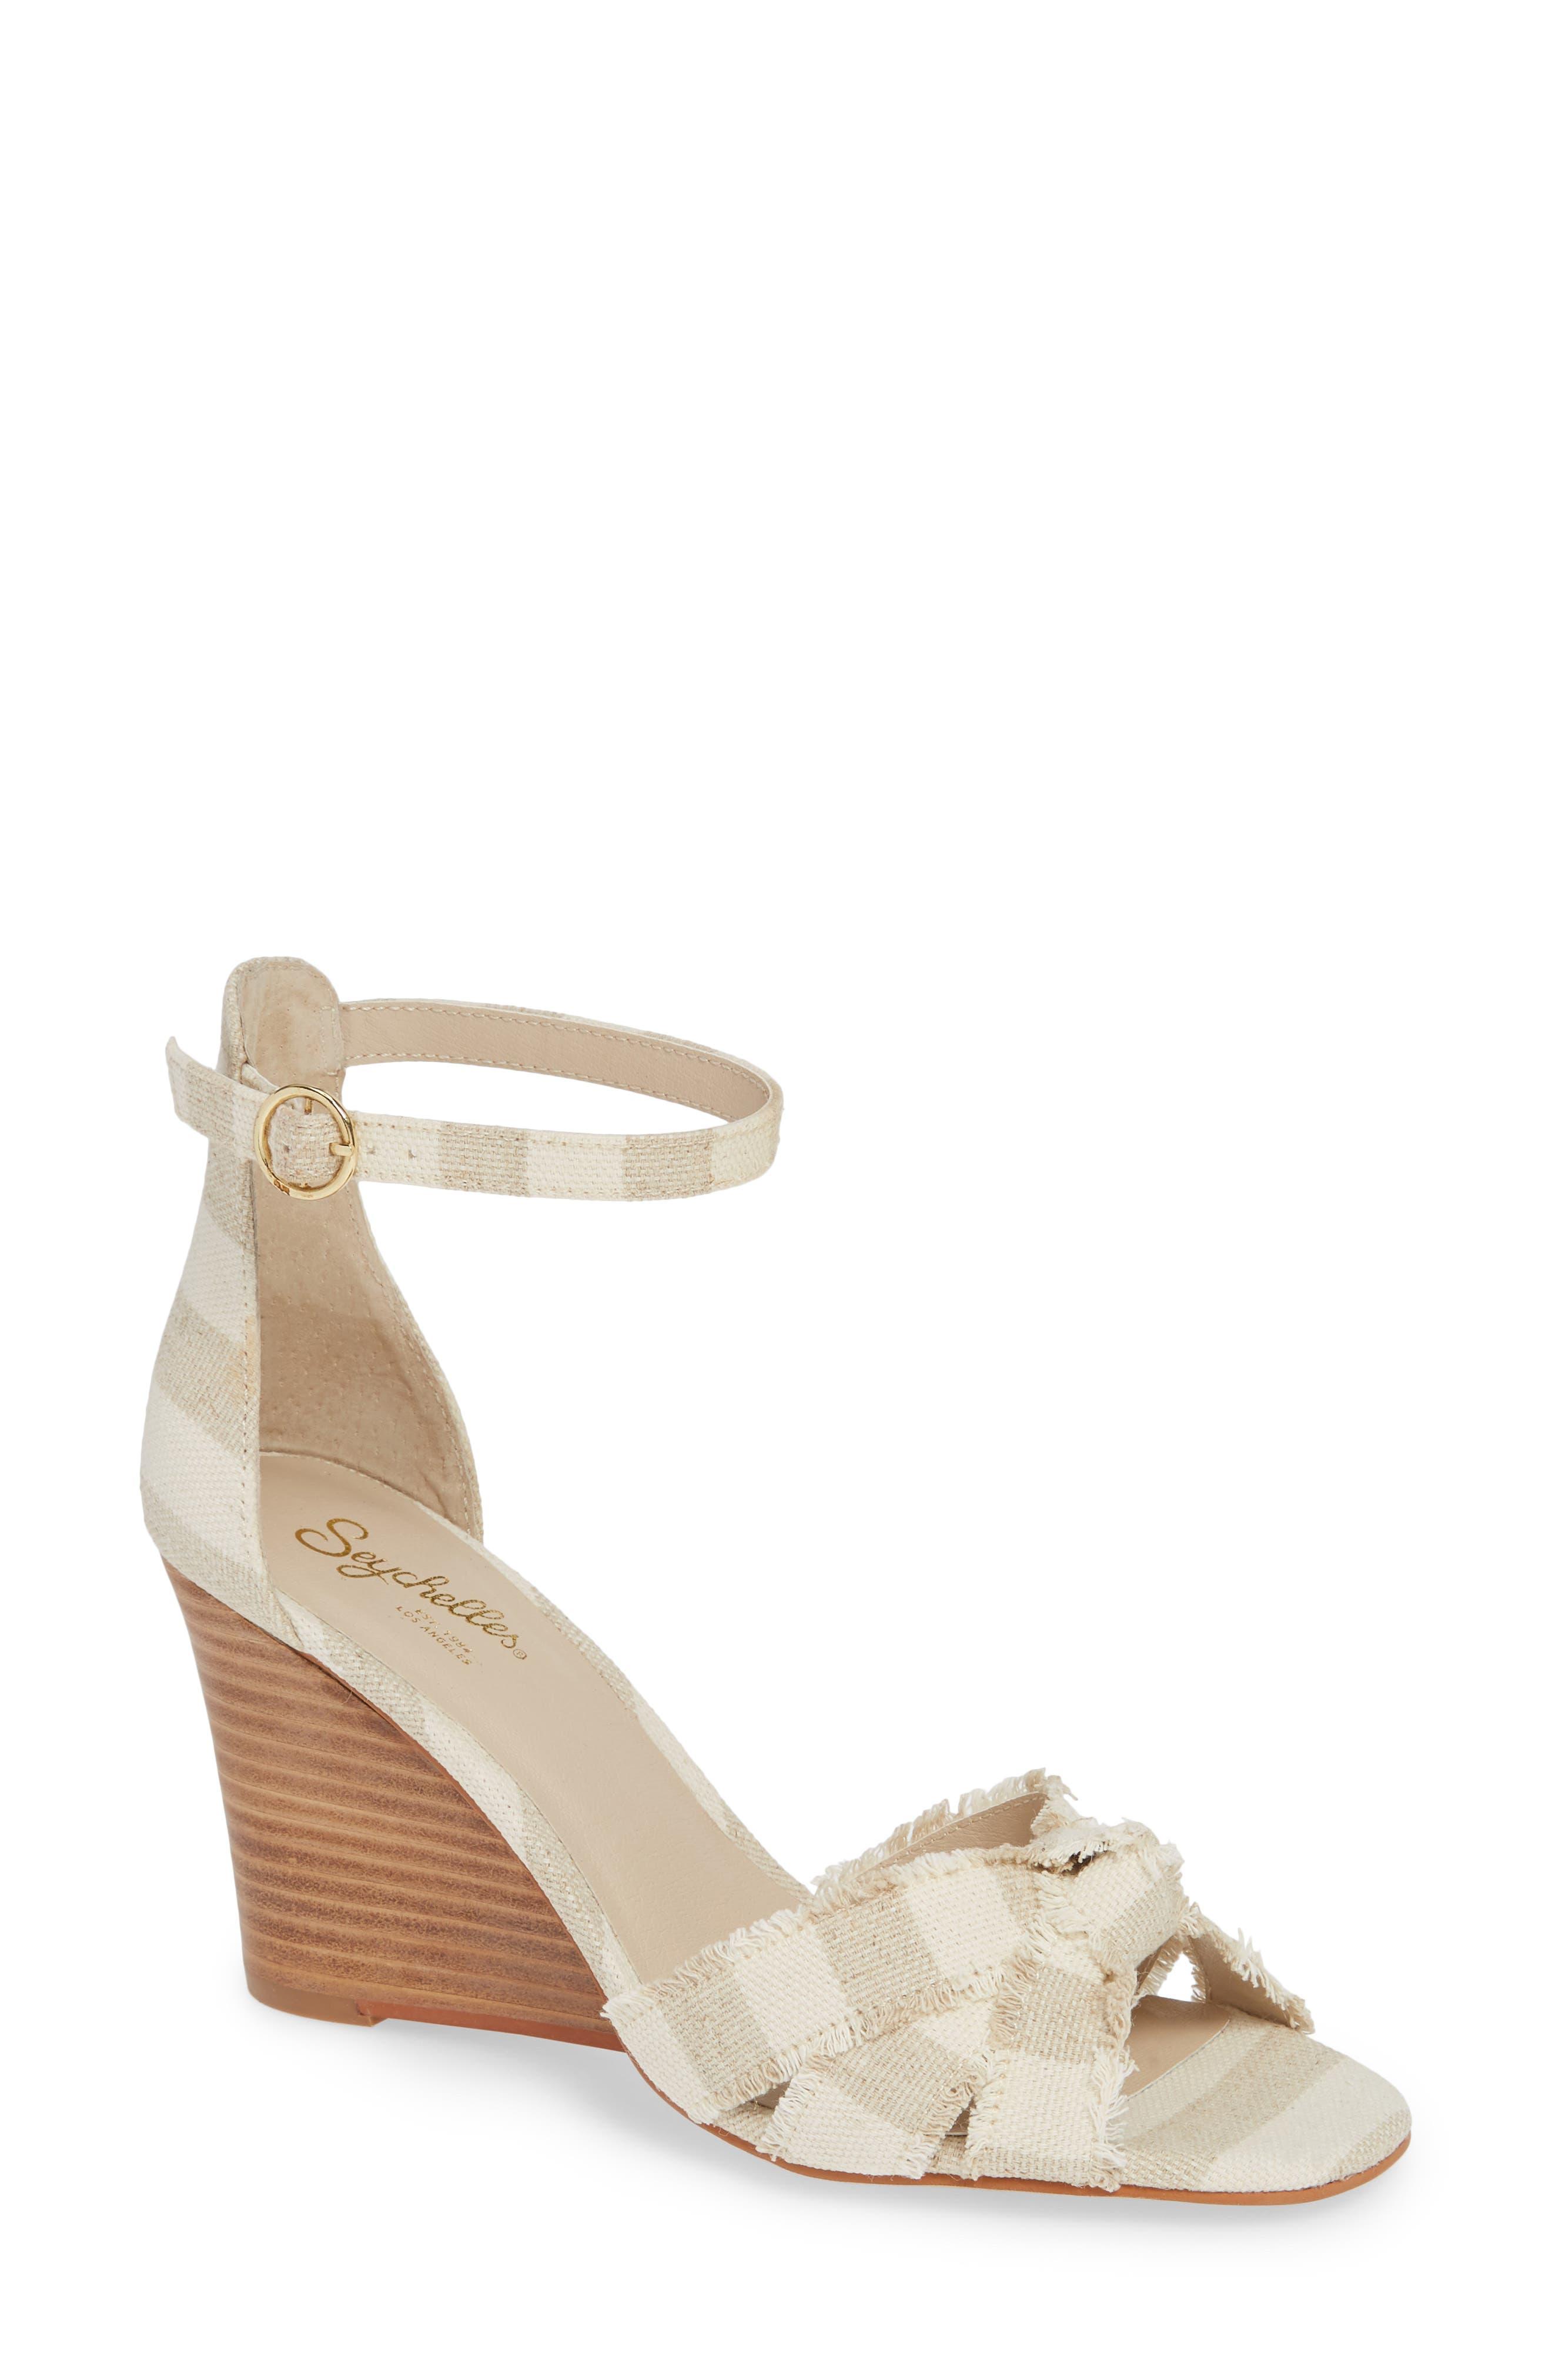 Sunrays Wedge Sandal,                         Main,                         color, NATURAL STRIPE FABRIC